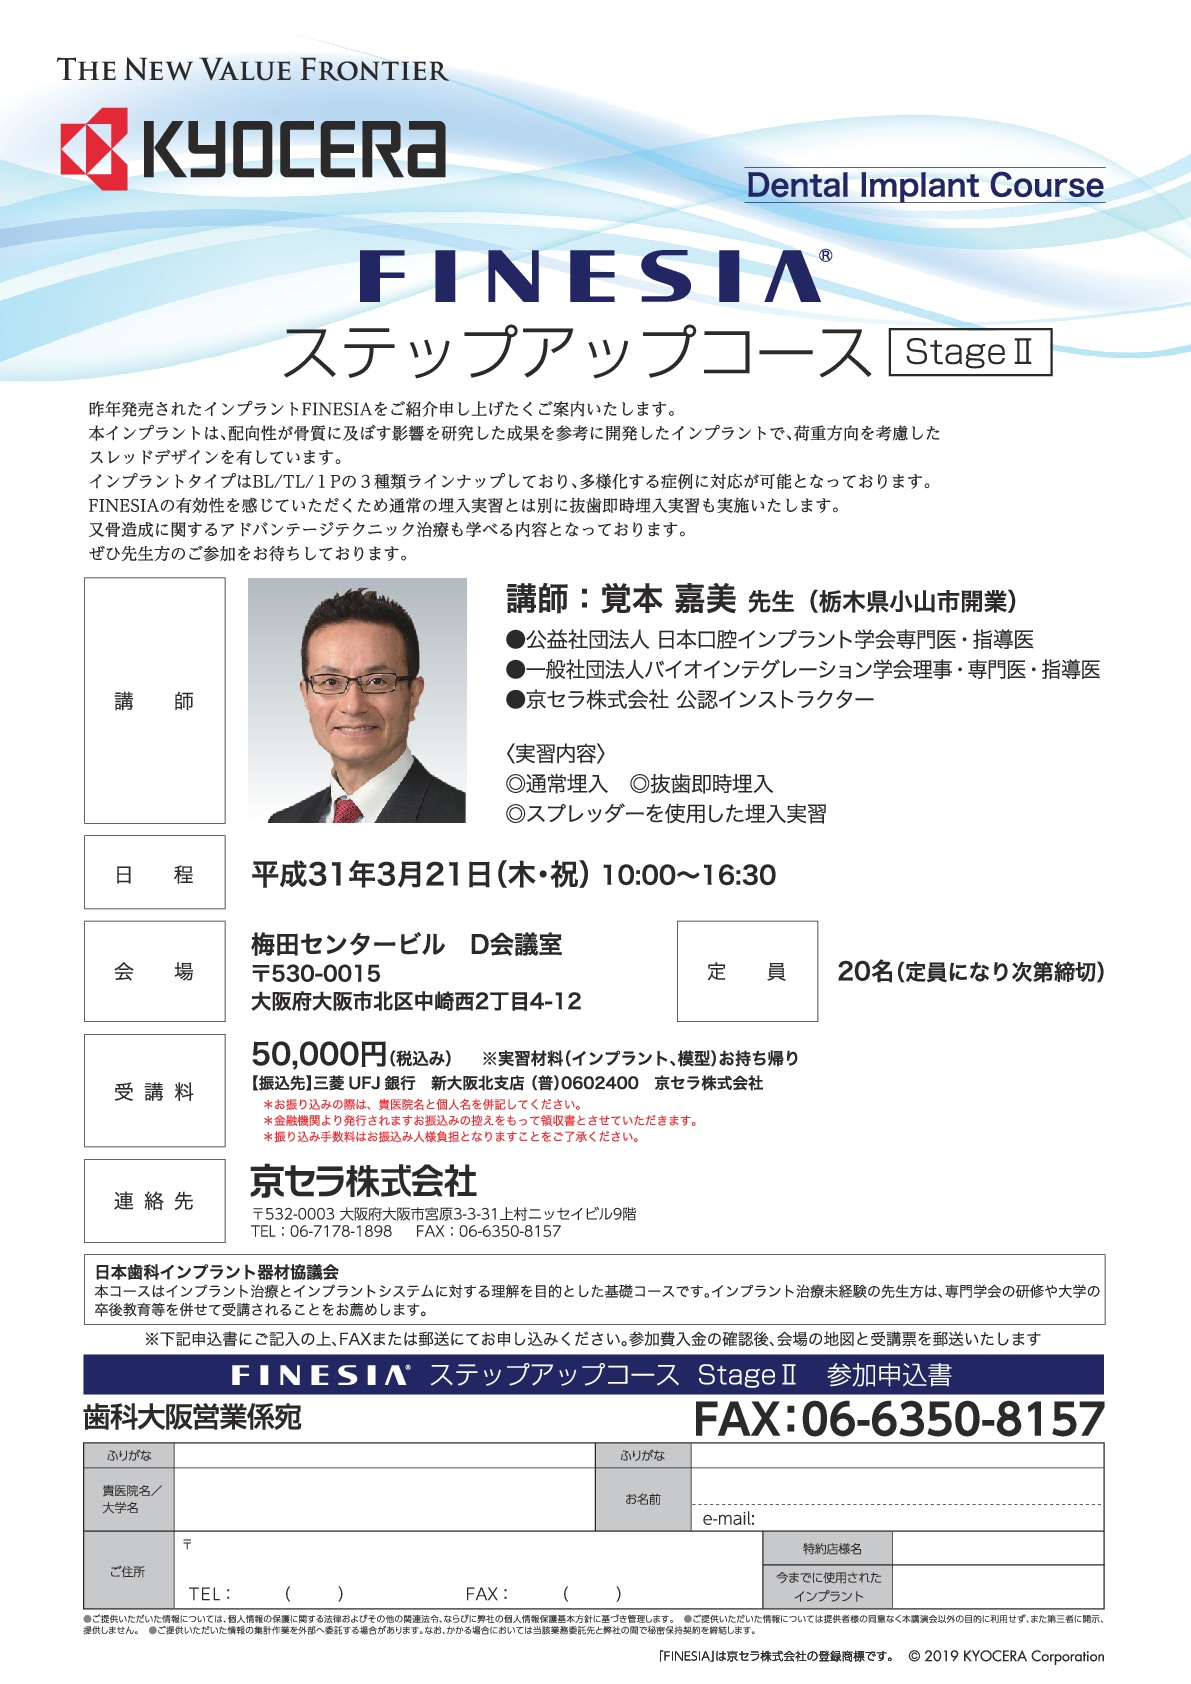 FINESIA ステップアップコース (StageII)